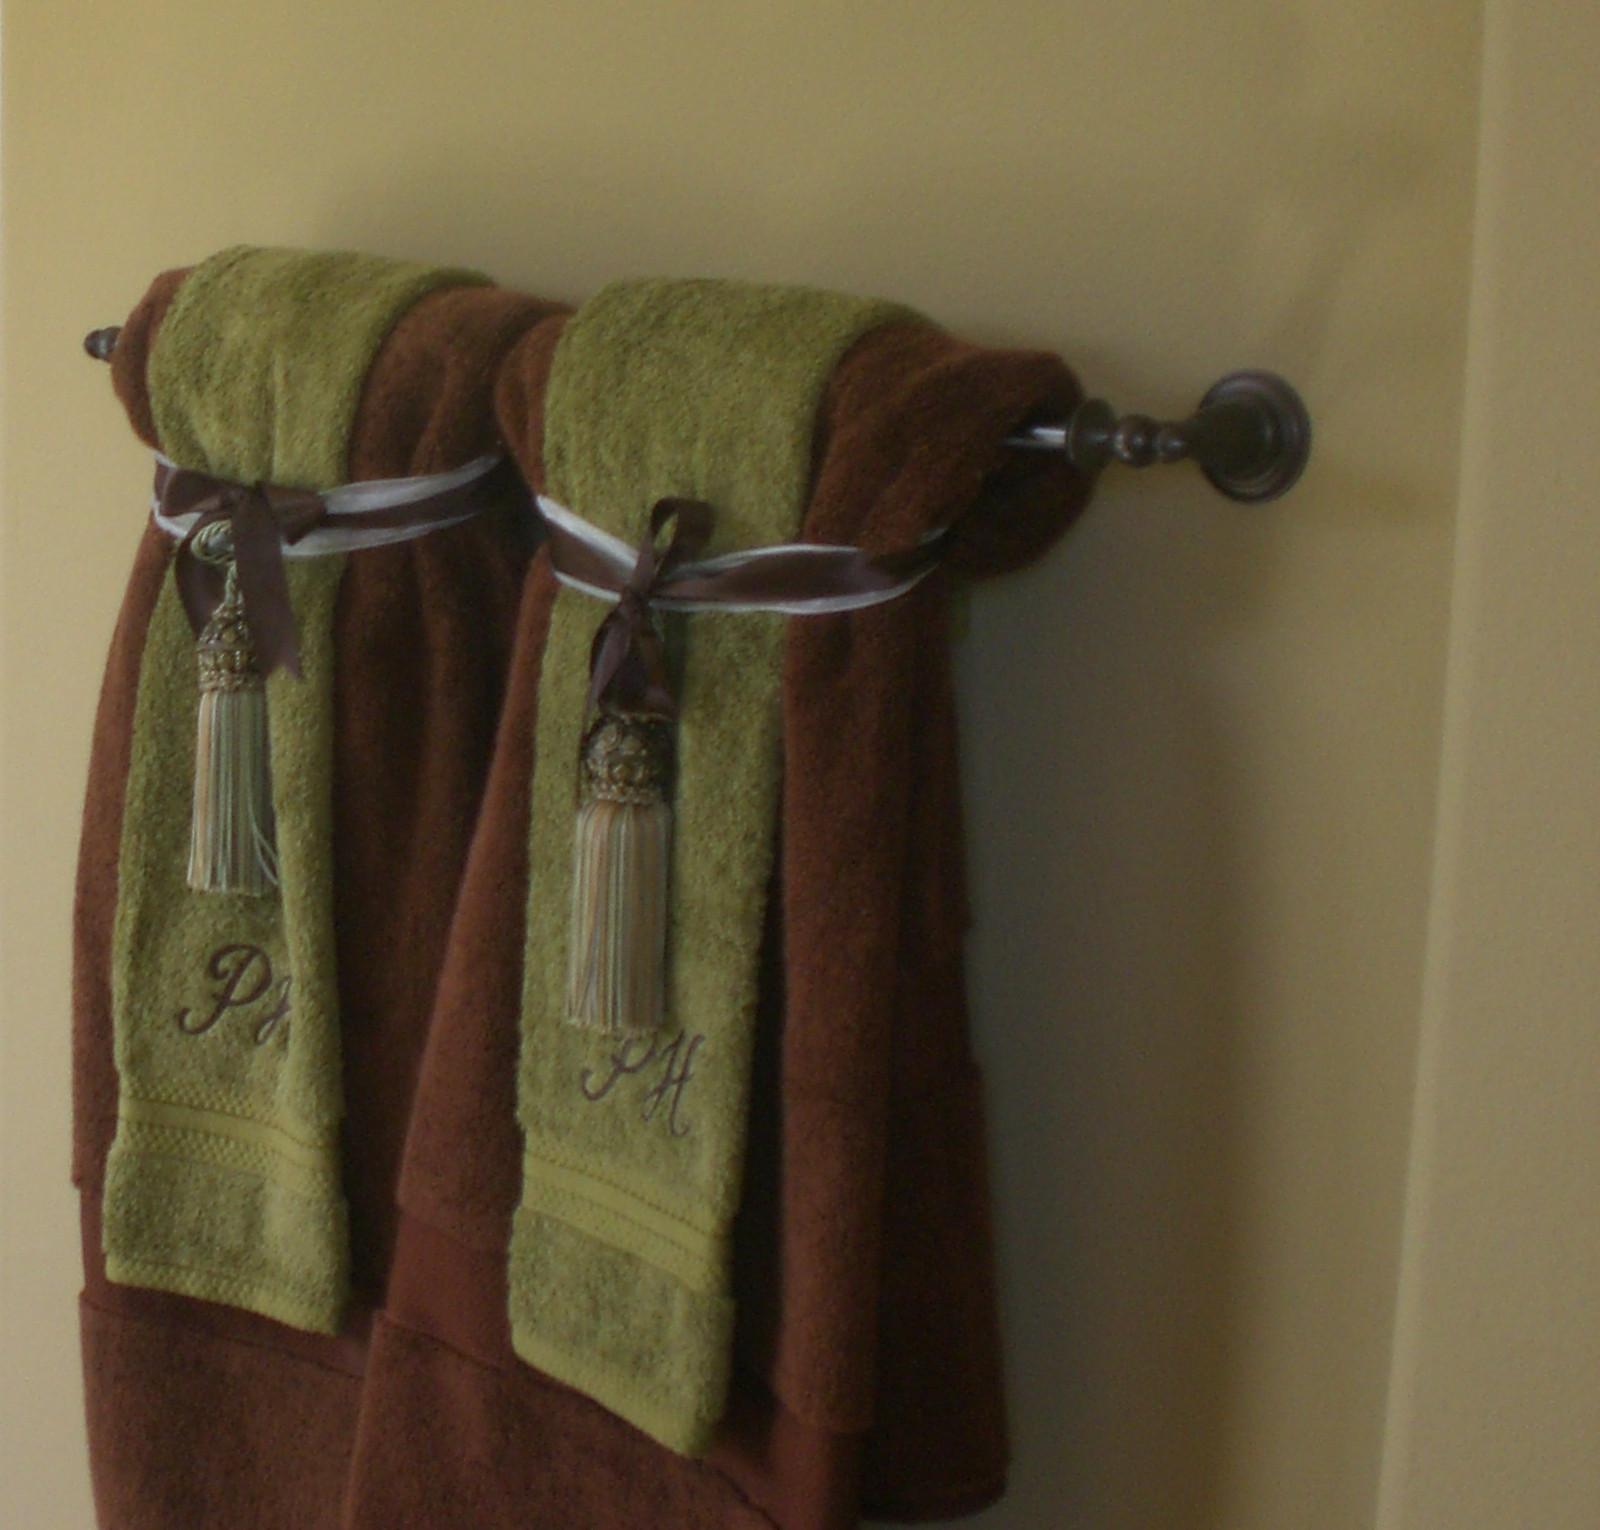 Bathroom towel Designs Beautiful Decorative towels In the Bathroom Babycenter